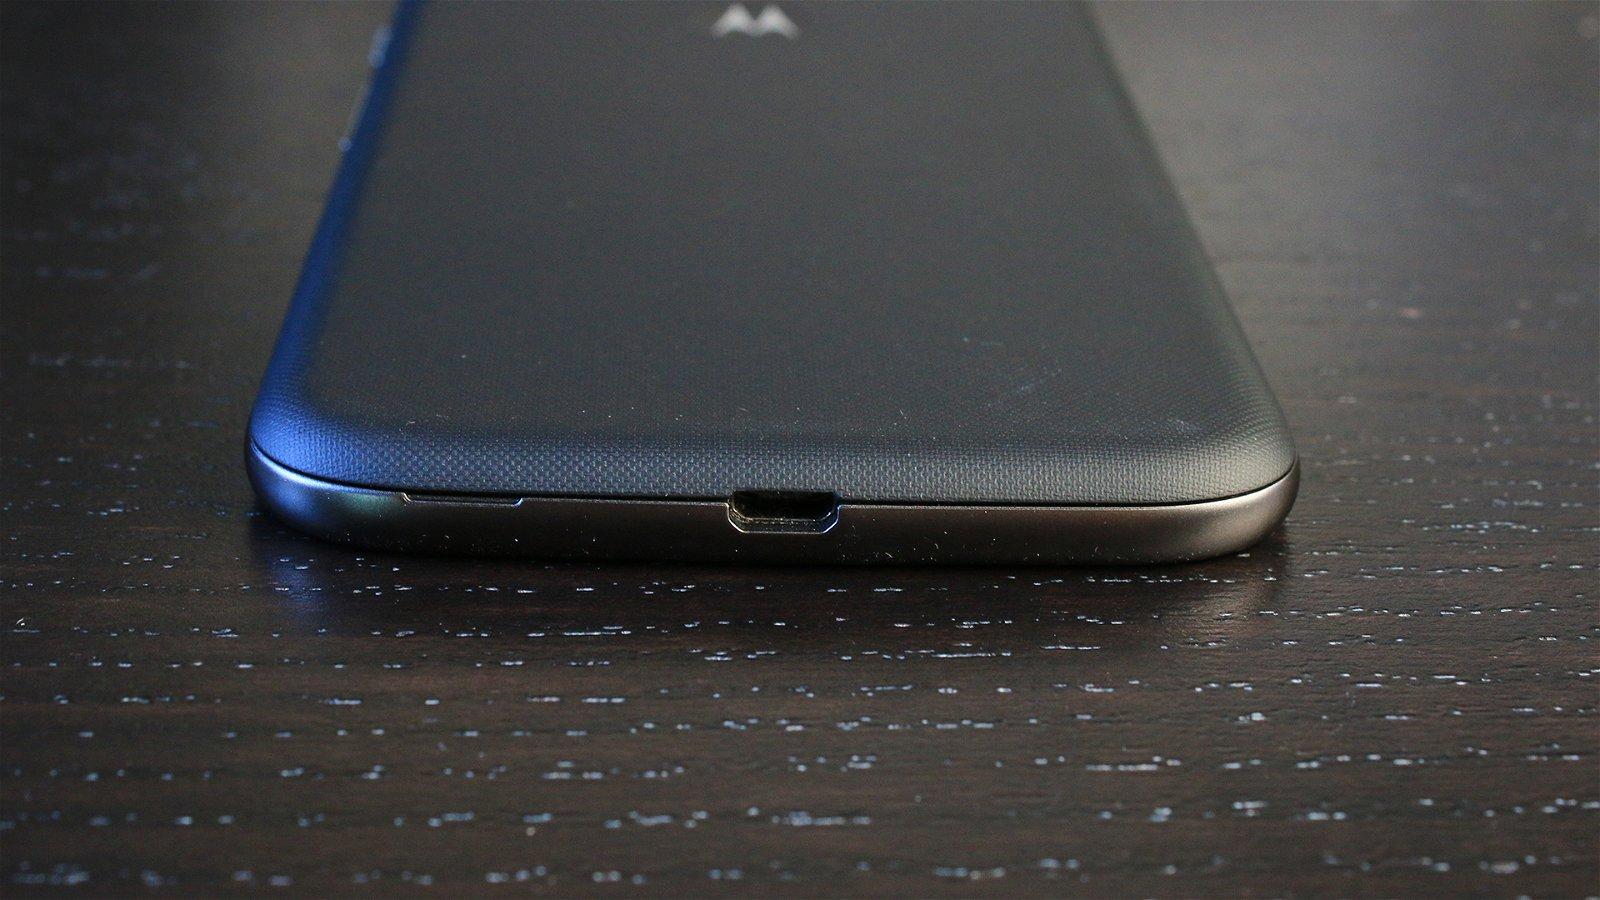 Moto G4 Plus (Smartphone) Review 9